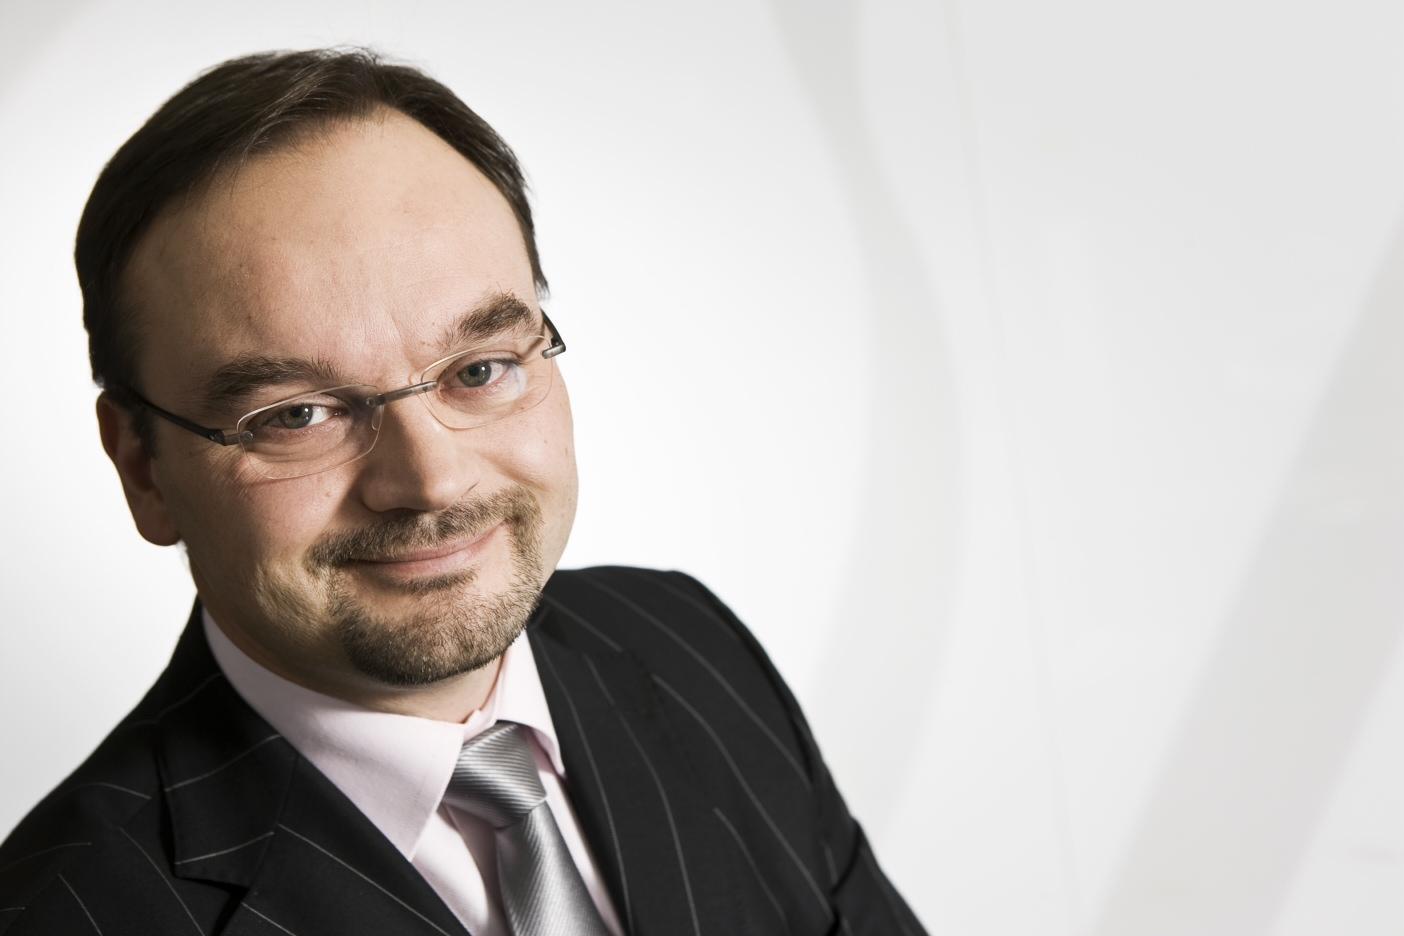 Aki Käyhkö, new CVP Scandic Finland